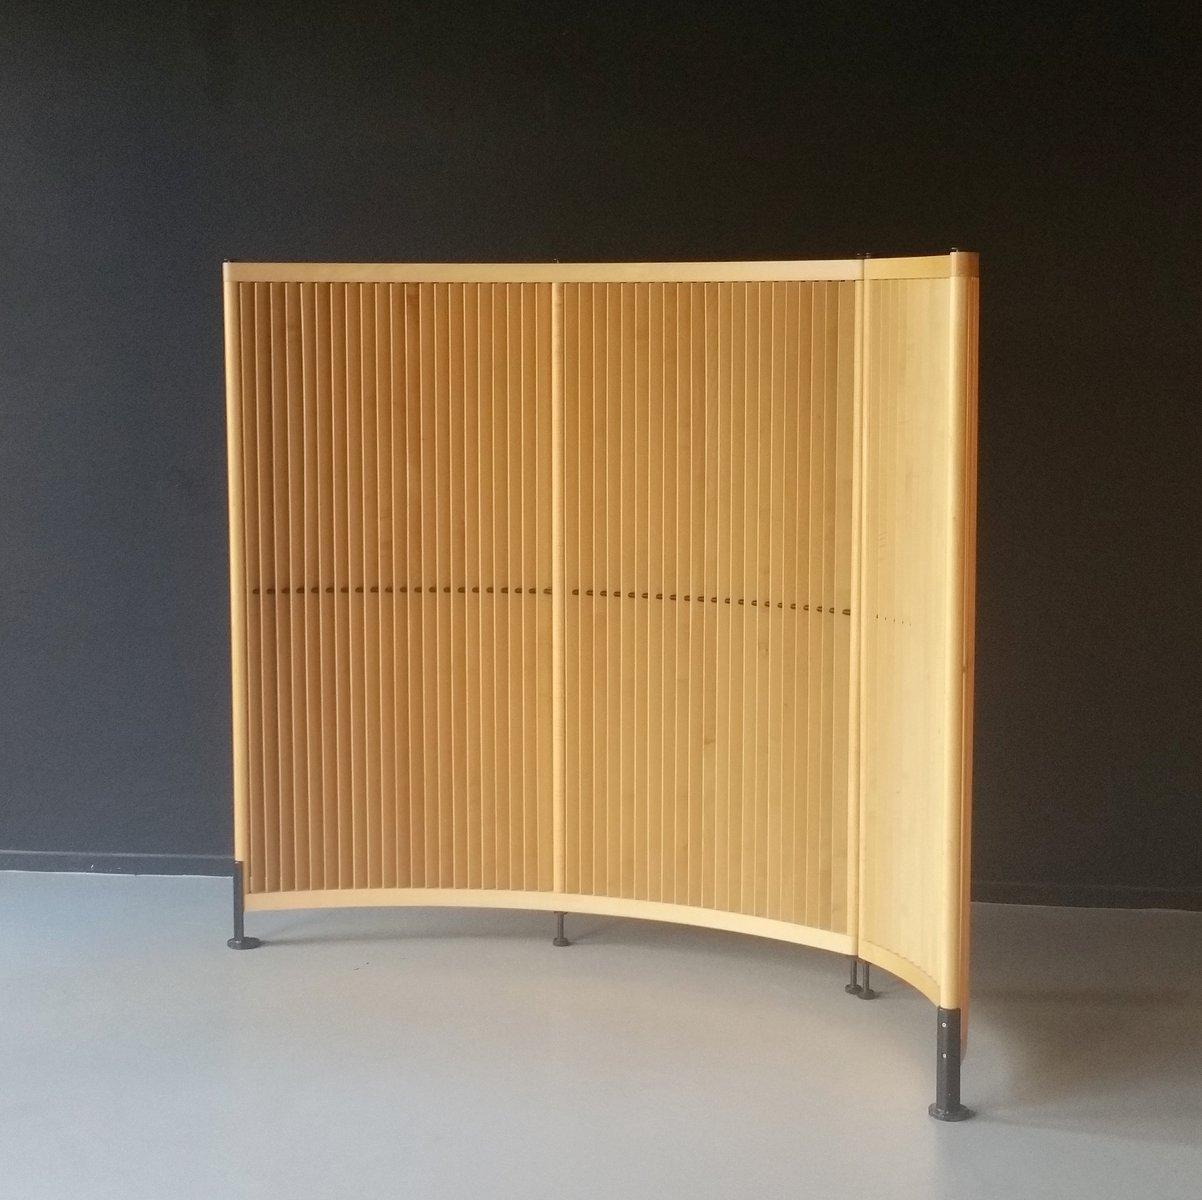 labyrint room divider by pelikan design for fritz hansen